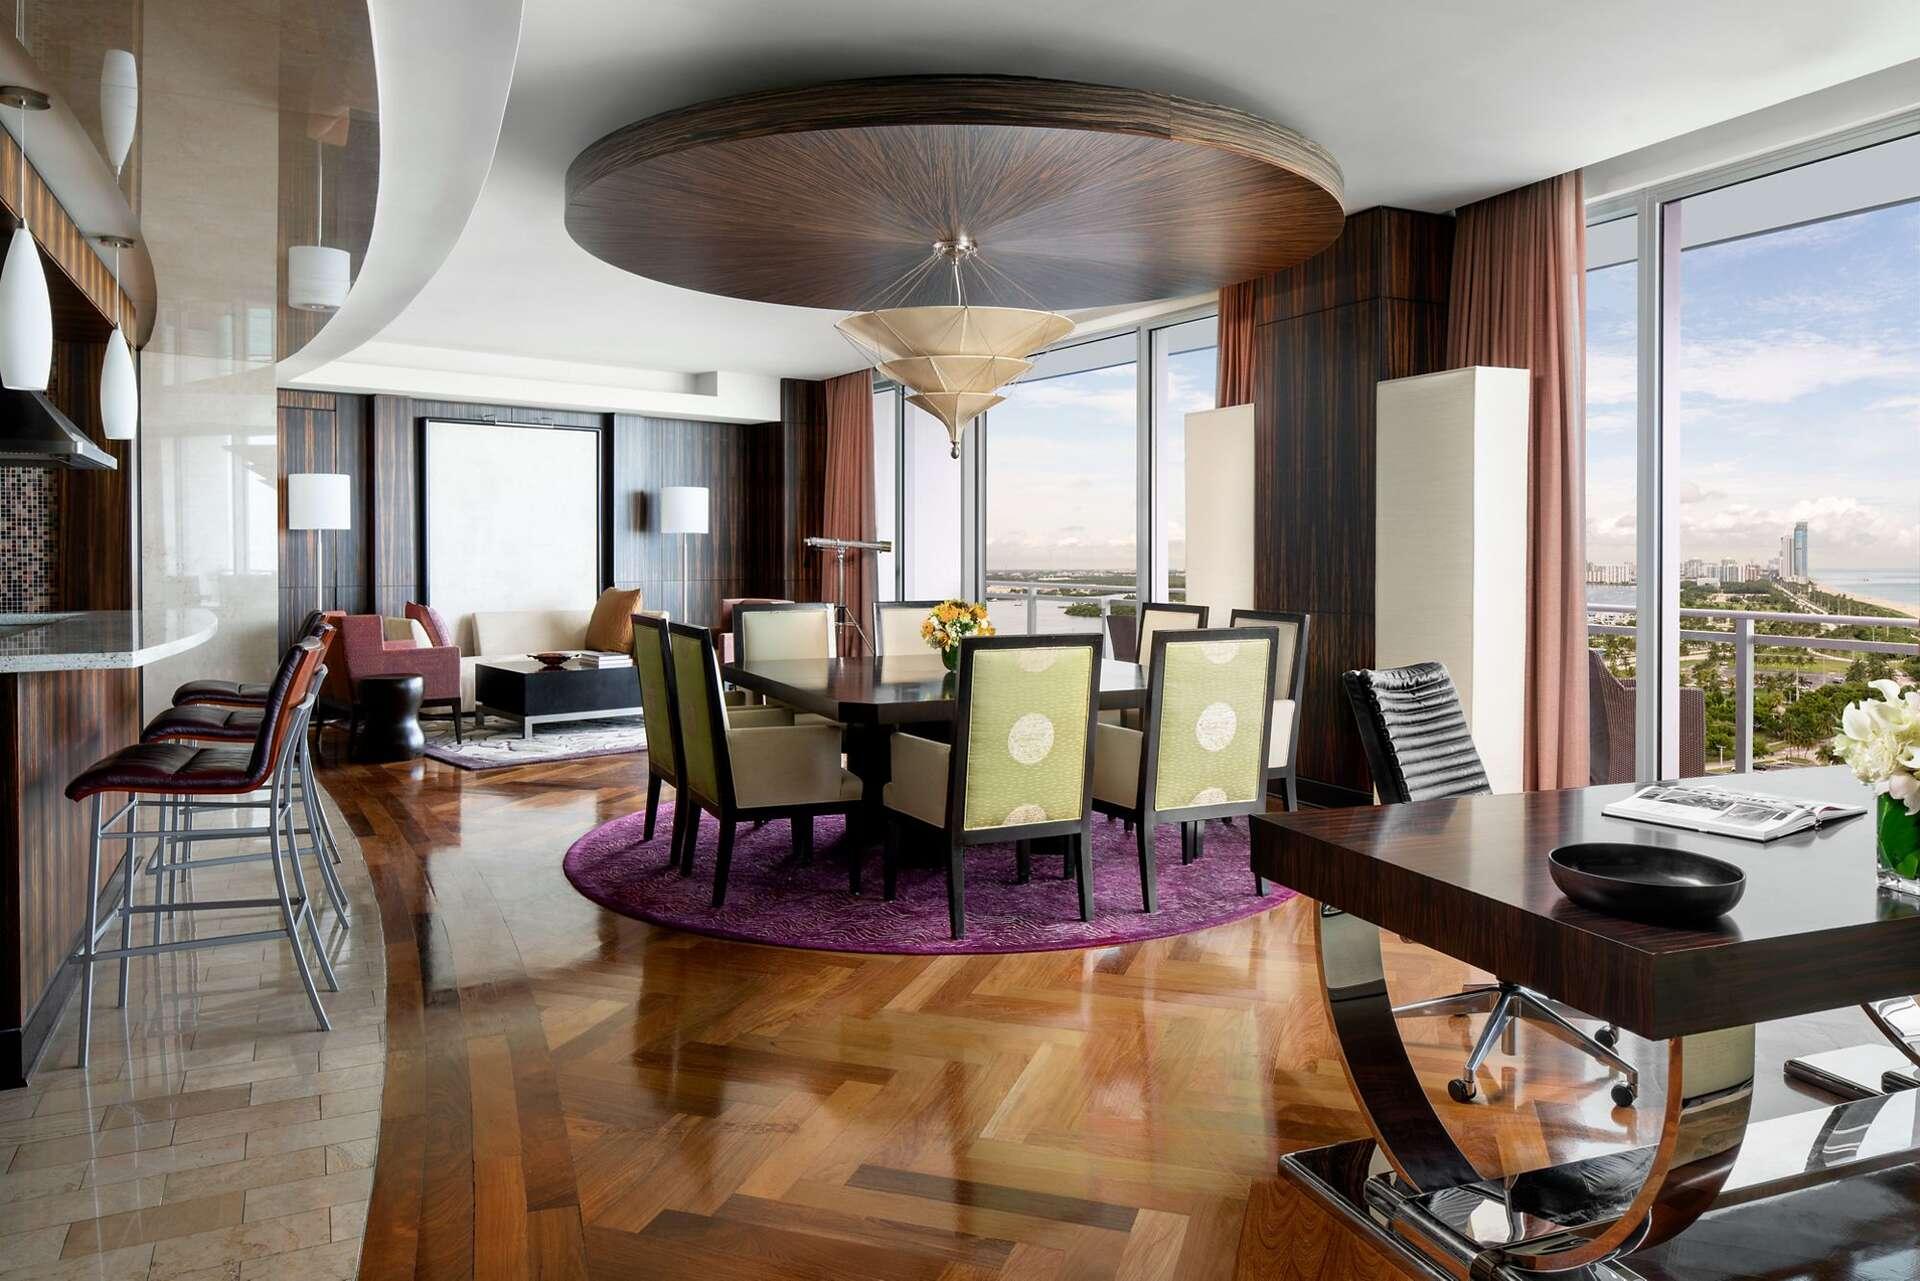 Luxury vacation rentals usa - Florida - Miami beach - Ritz carlton bal harbour - The Presidential Suite - Image 1/15